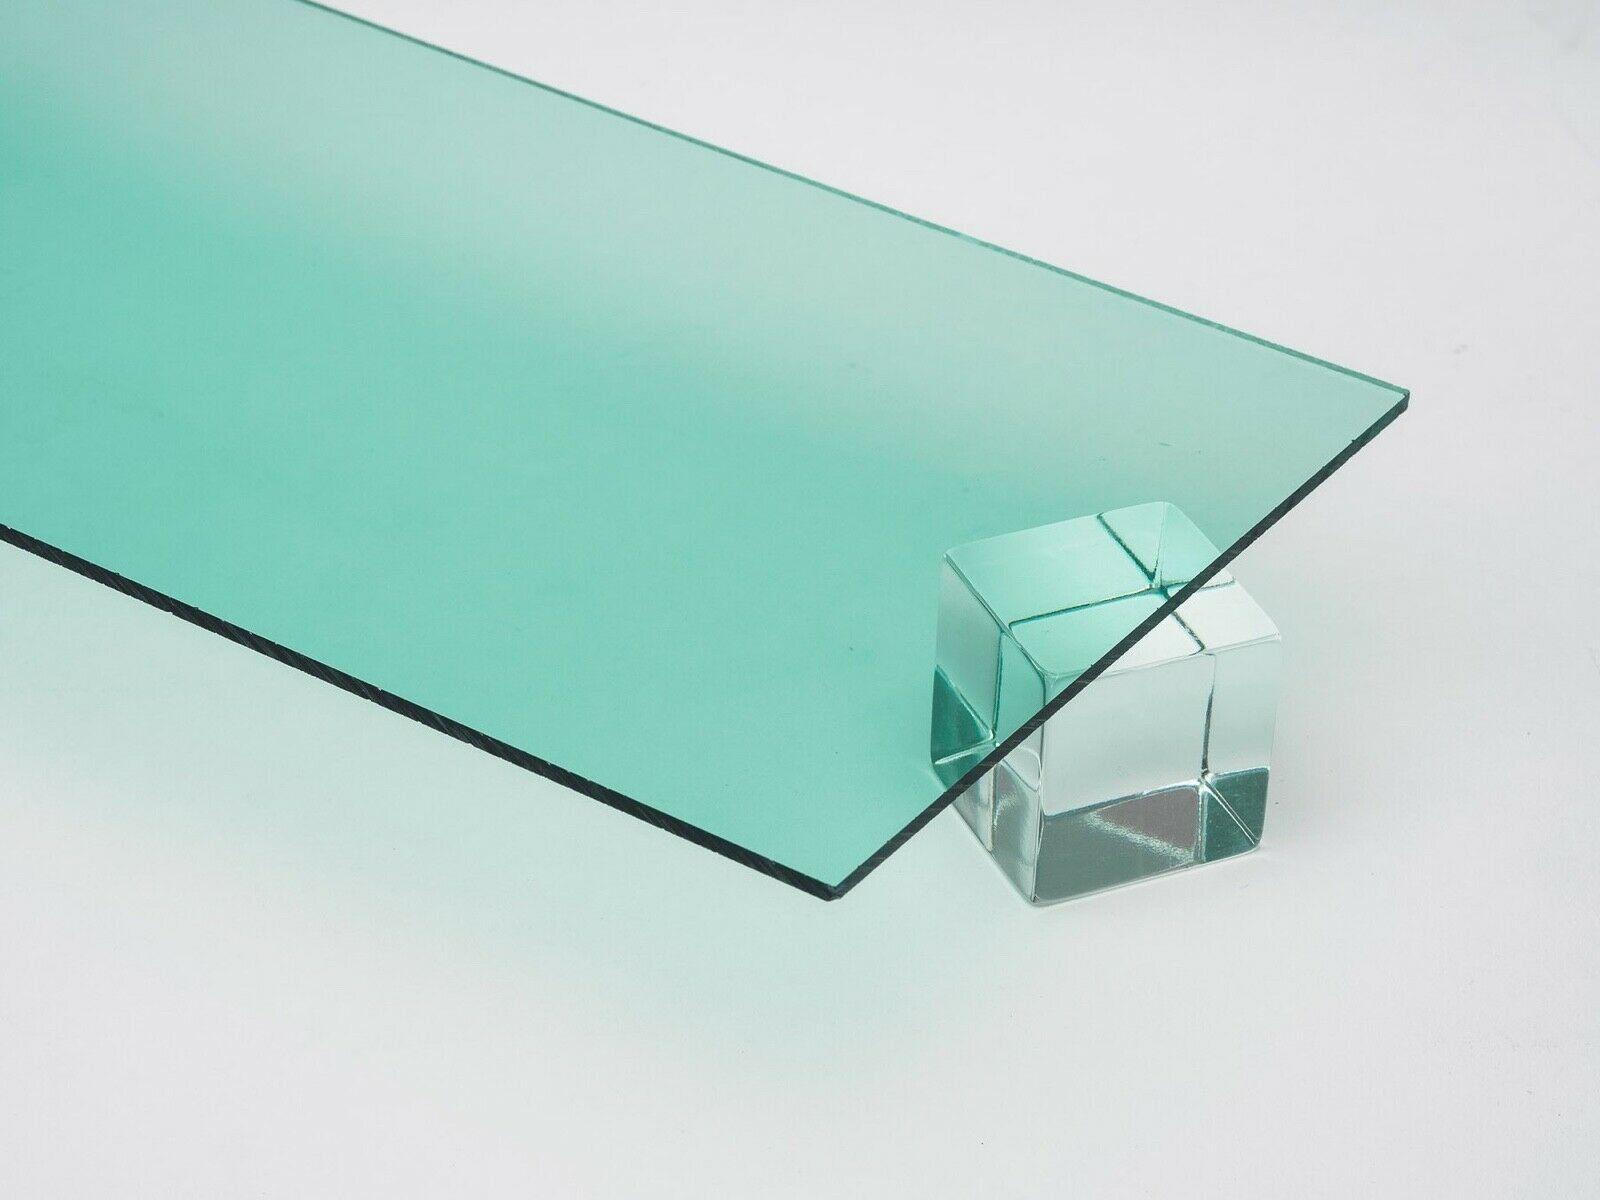 Acrylic Sheet 1 4 Clear Glass Effect Green Edge Etsy In 2020 Acrylic Sheets Clear Glass Colored Acrylic Sheets